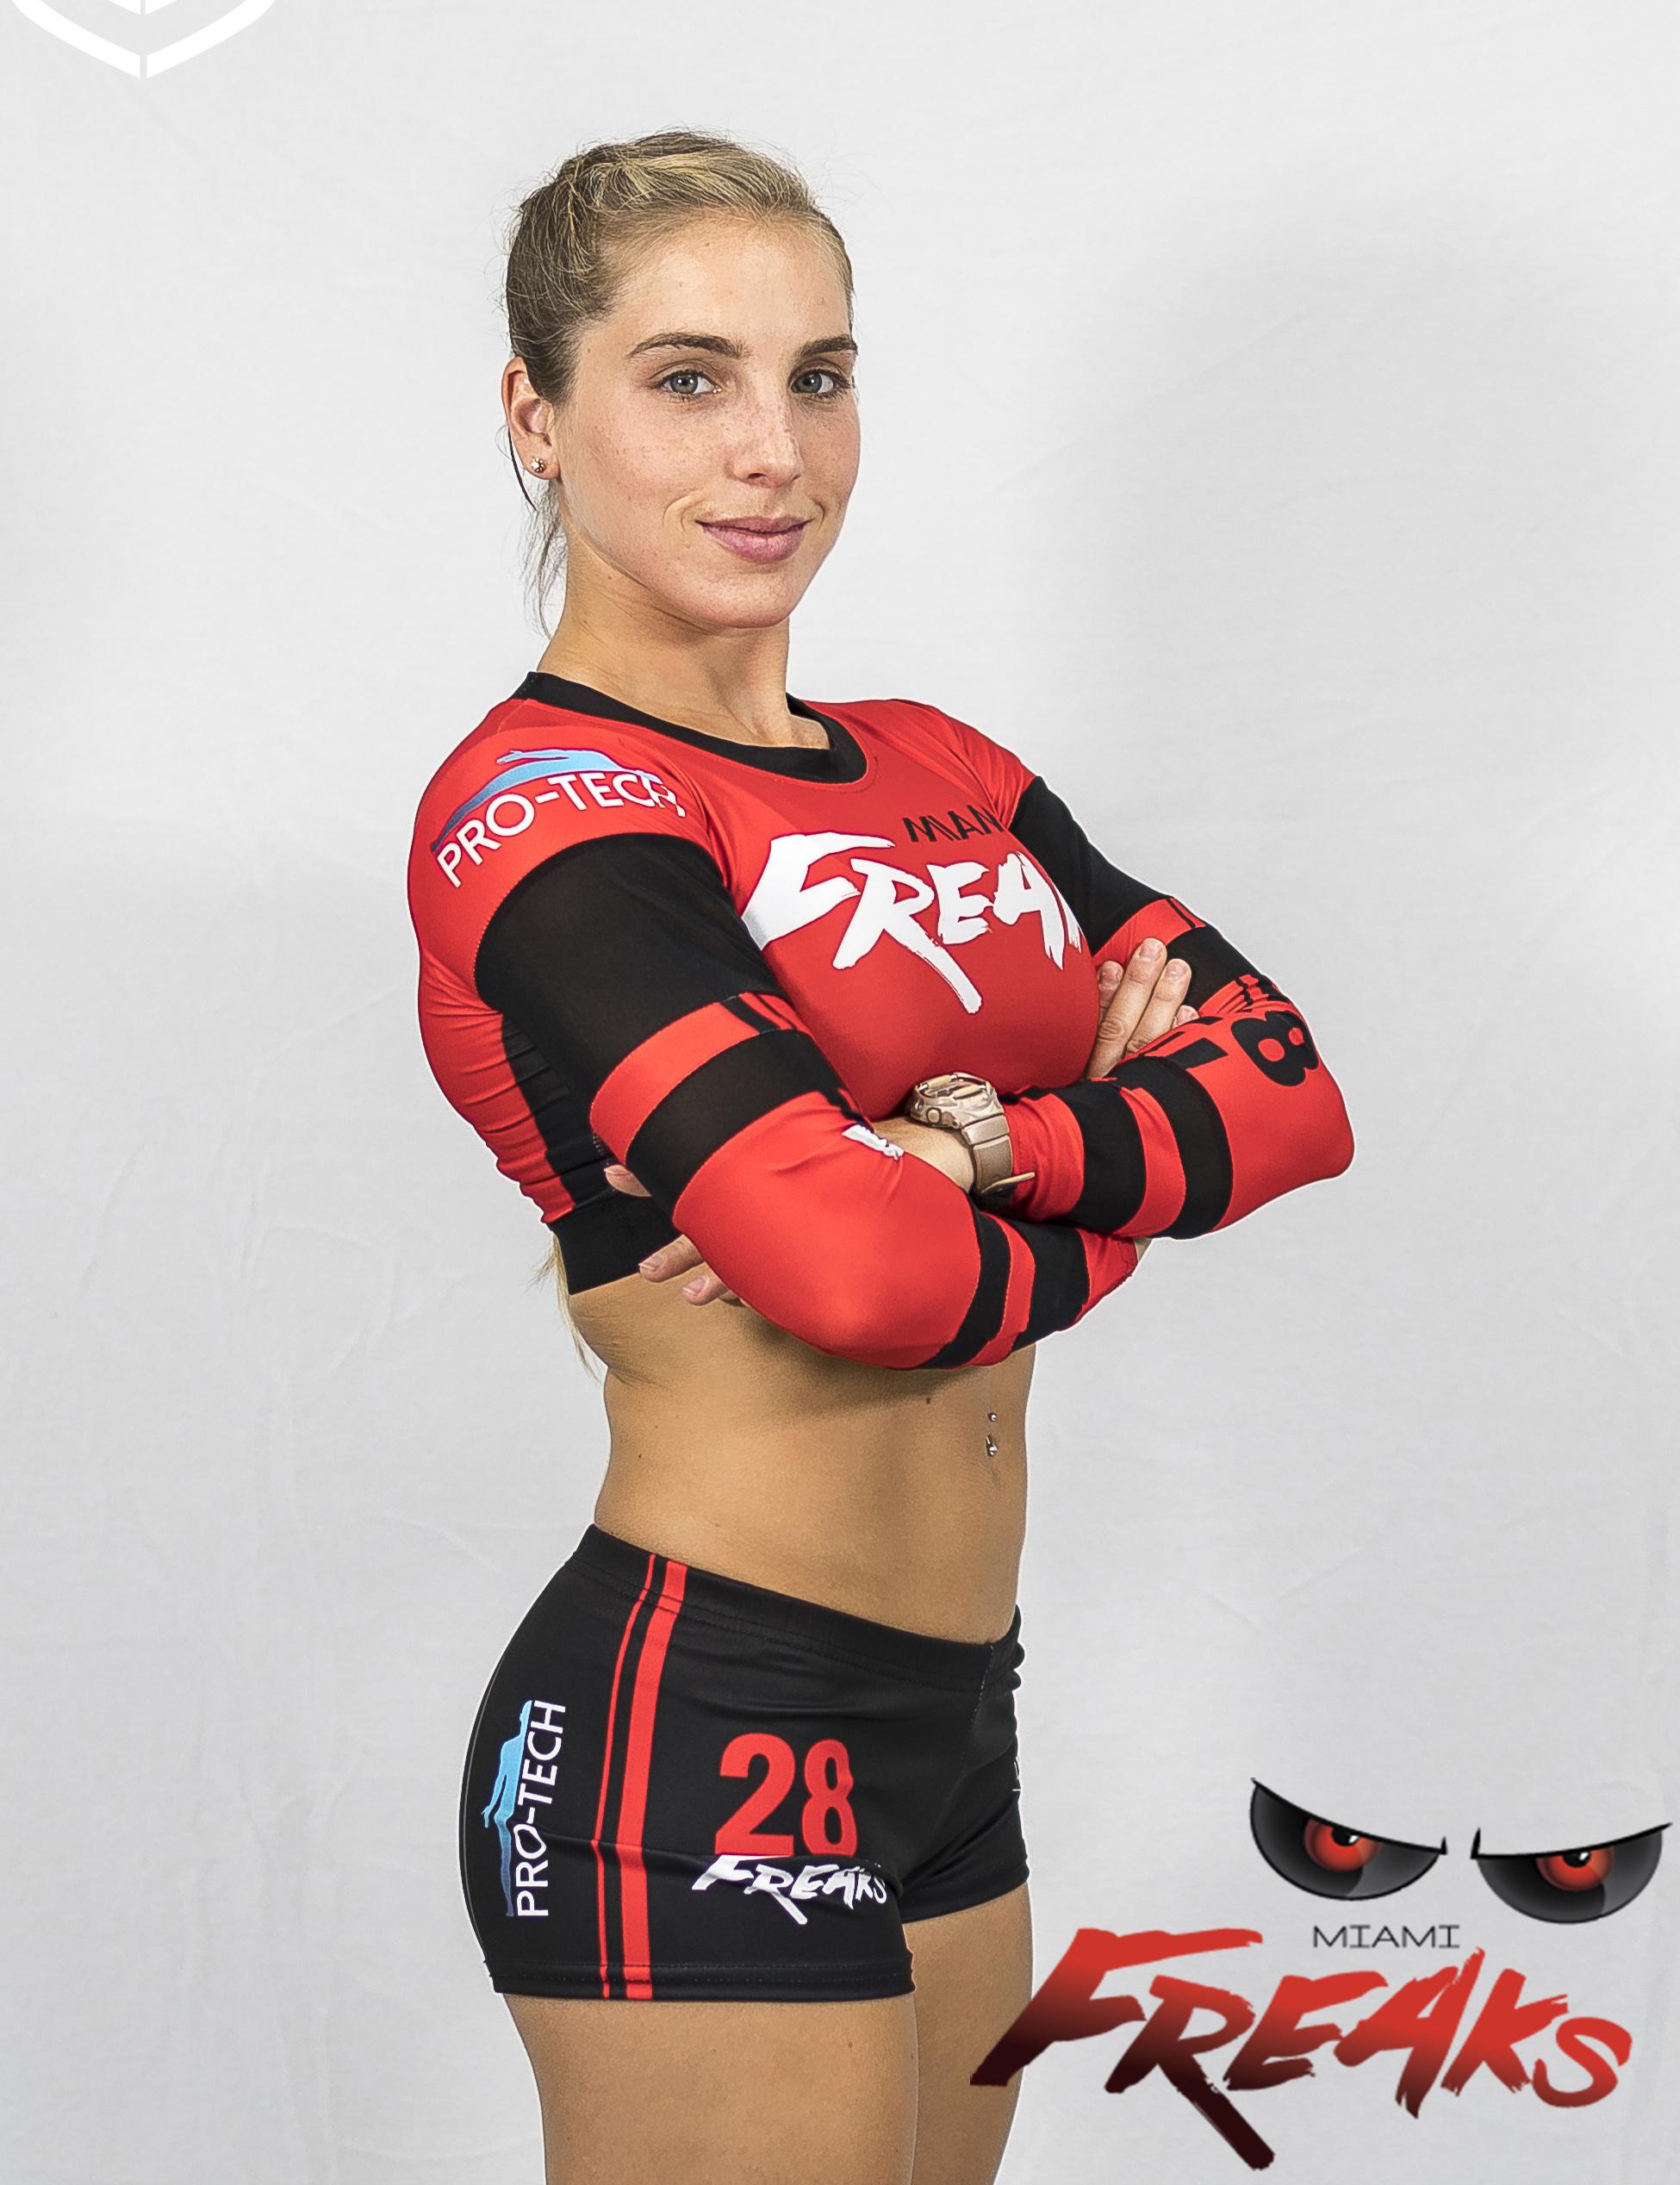 Julie Gonzalez - #28